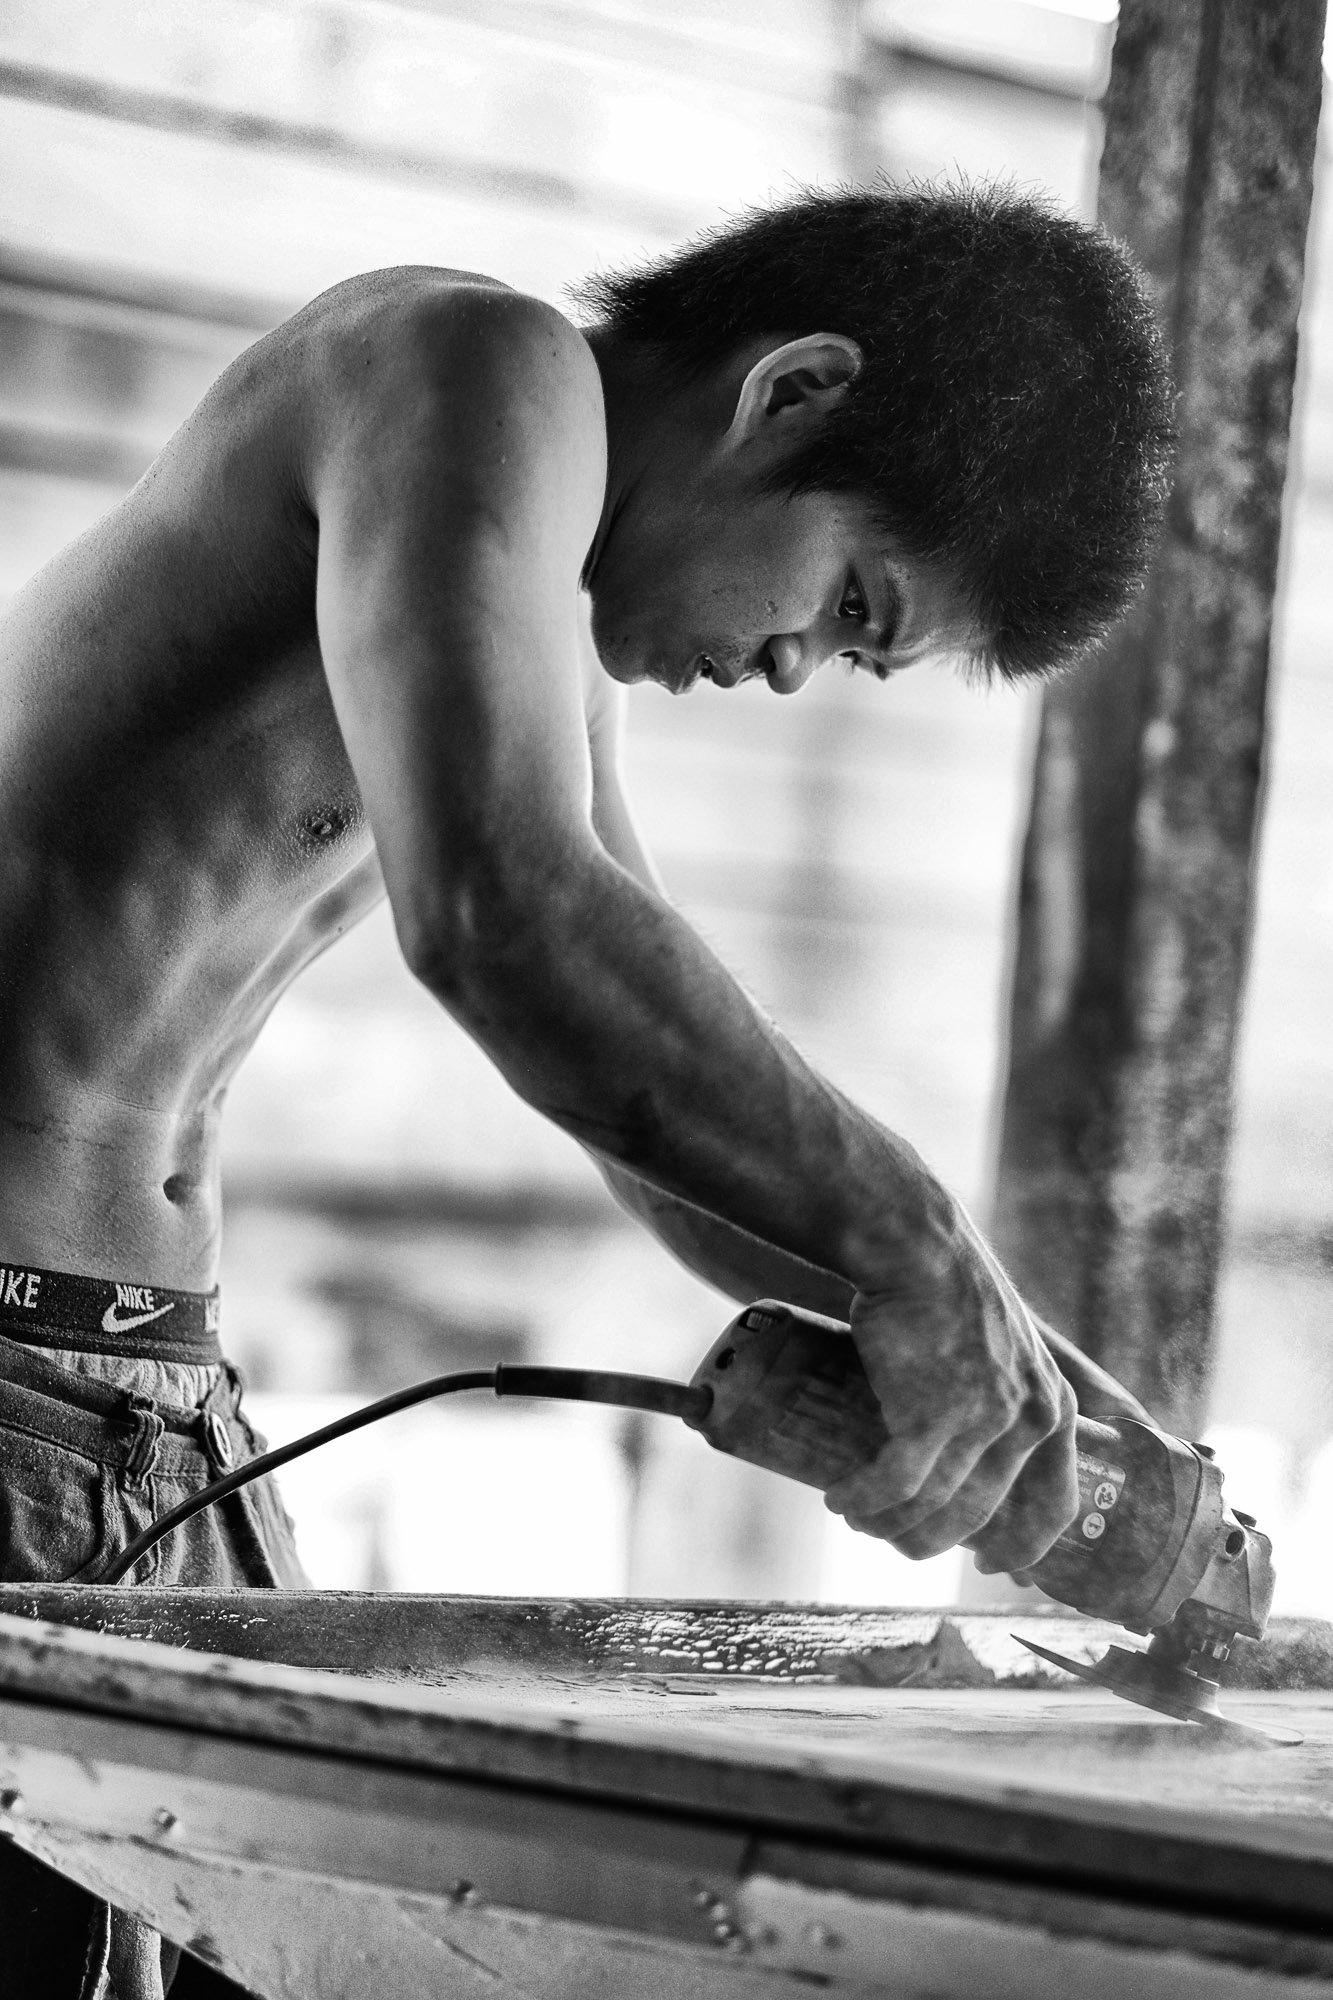 BRUNEI borneo street photography worker man